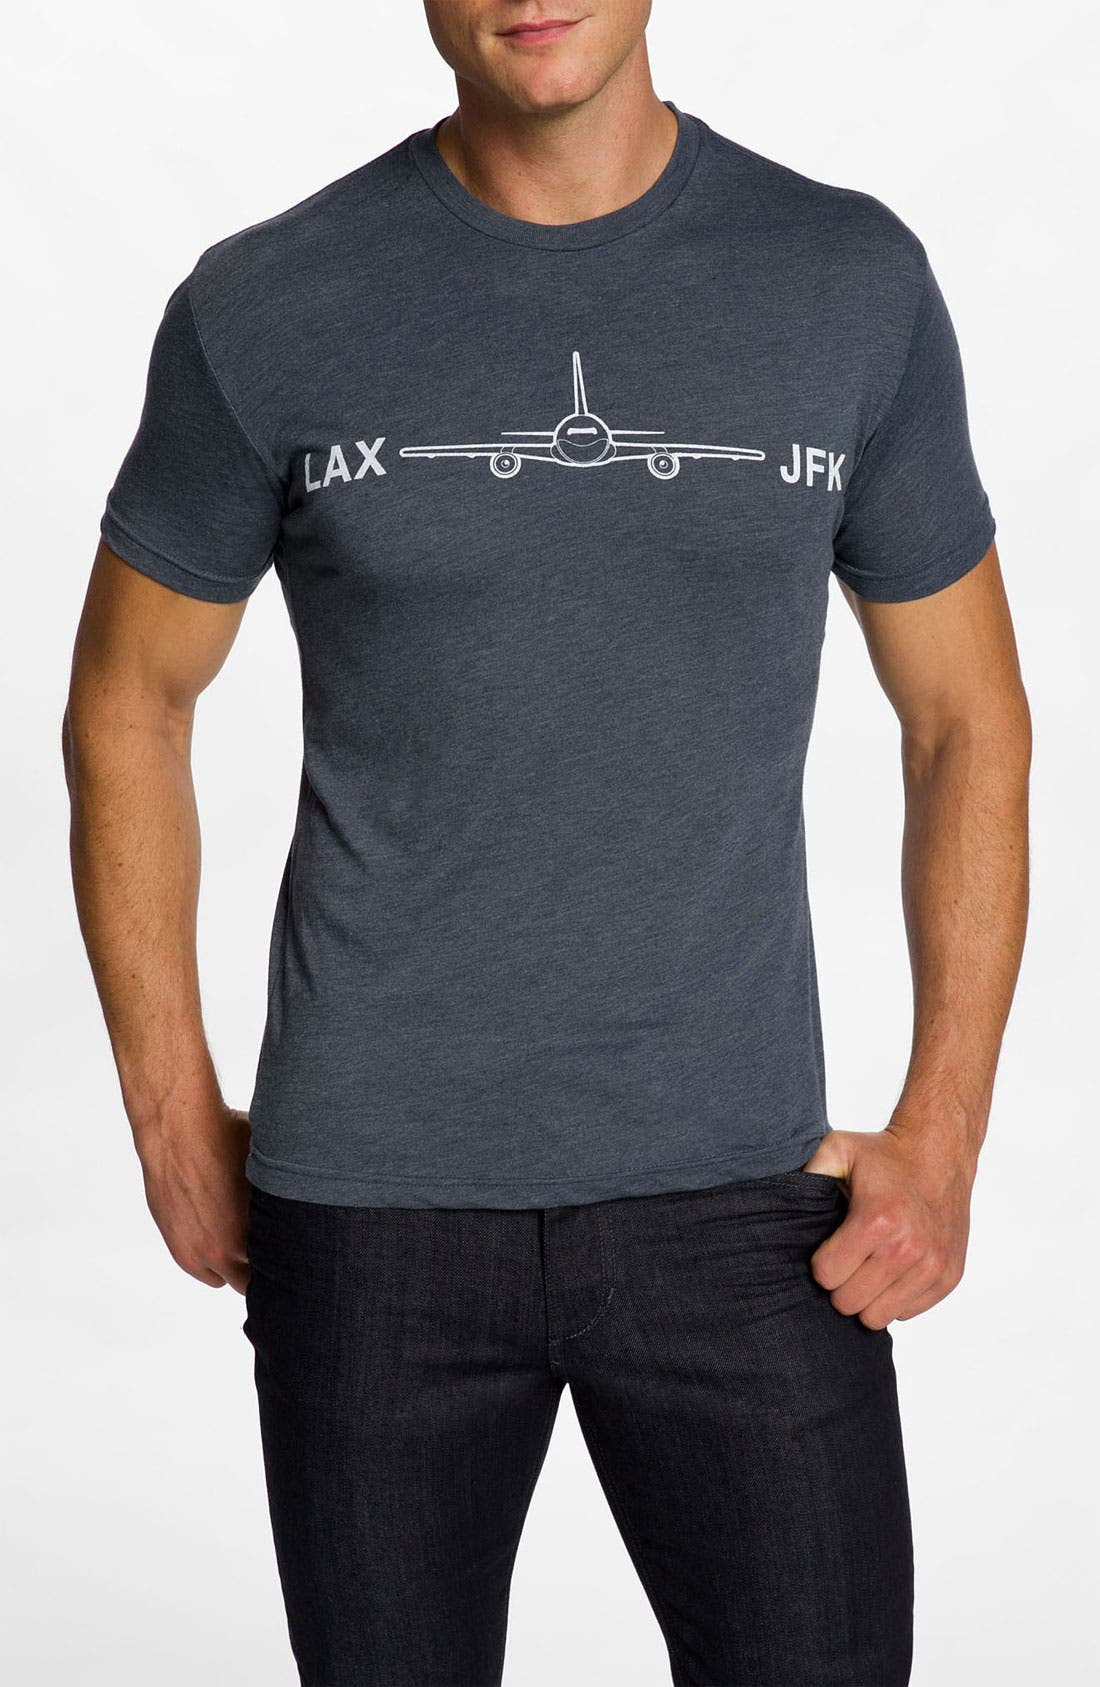 Main Image - DiLascia 'LAX - JFK' T-Shirt